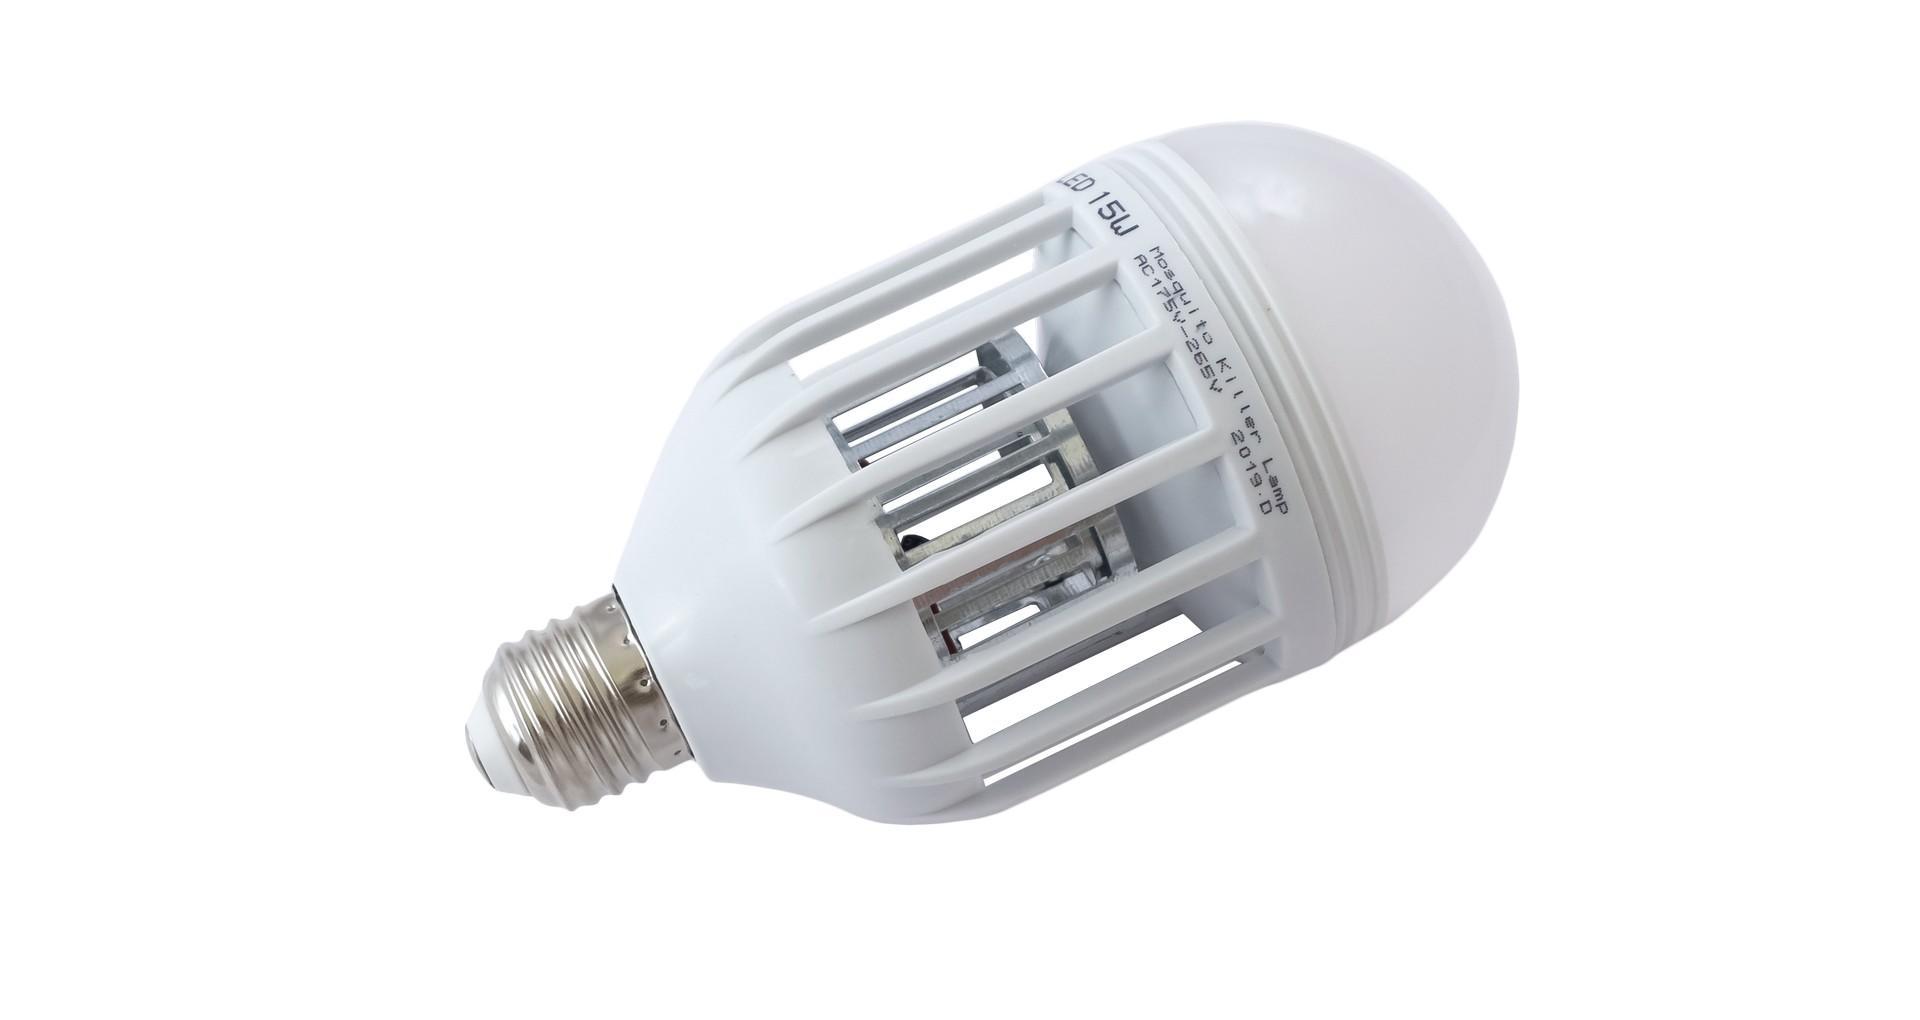 Лампа антимоскитная Elite - 15 Вт 3